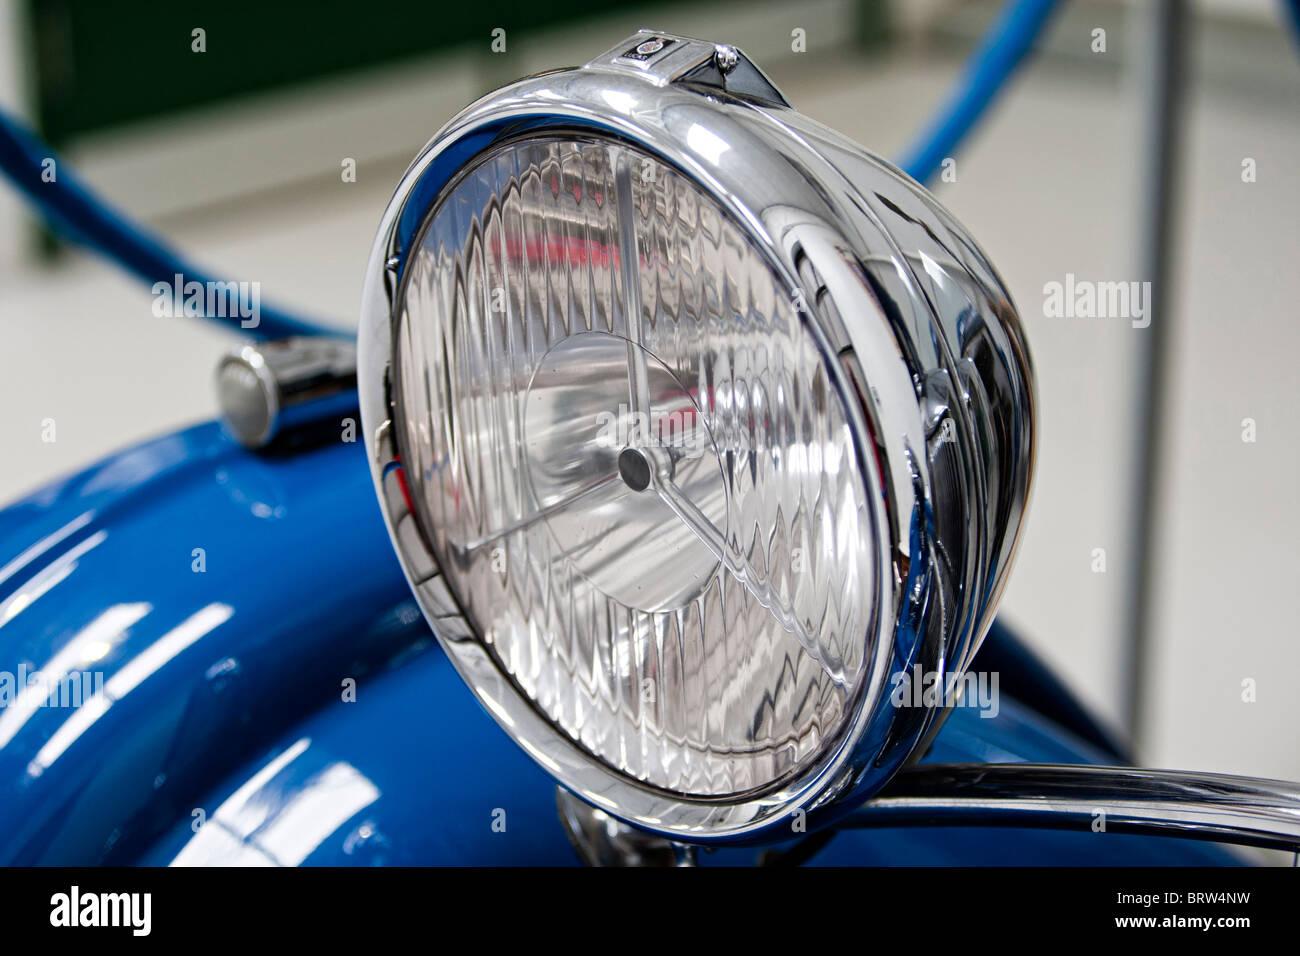 Car headlamp on old classic British car - Stock Image